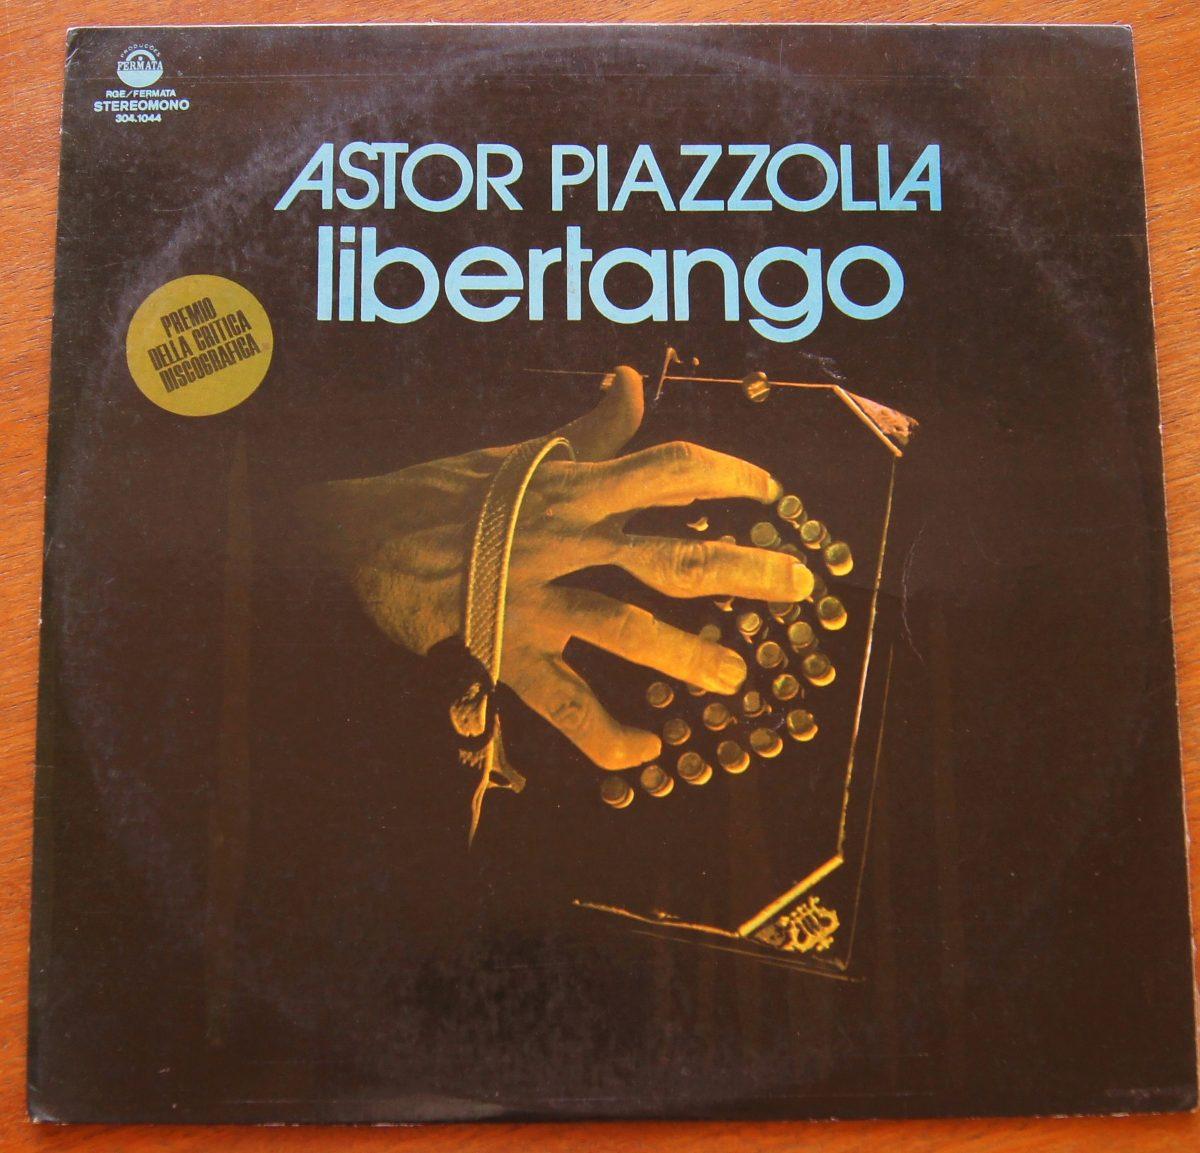 Lp Astor Piazzolla - Libertango